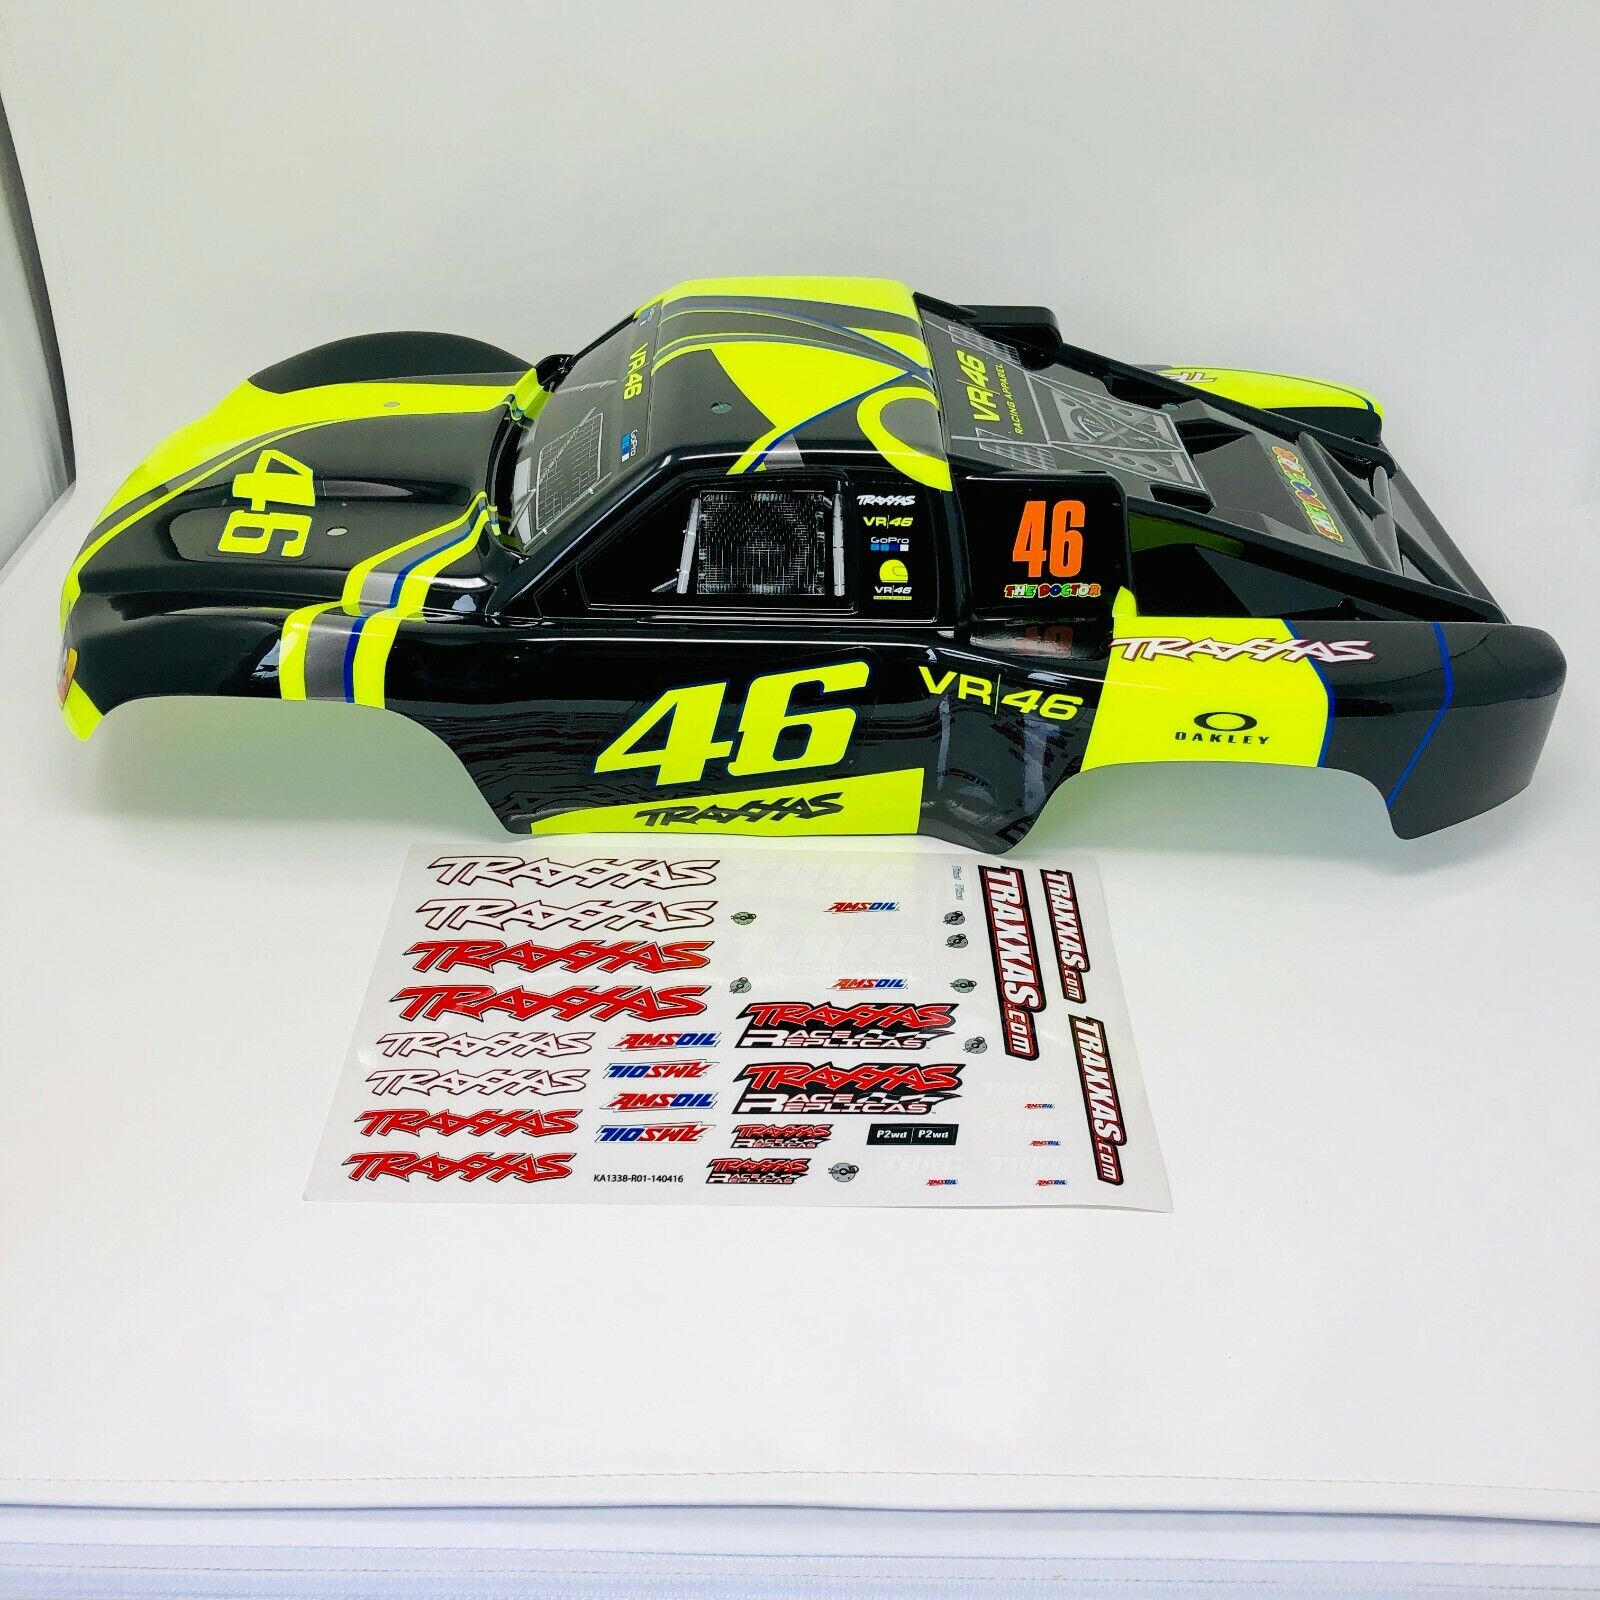 NEW Traxxas Slash VR46 Body Valentino Rossi Yellow Black GoP